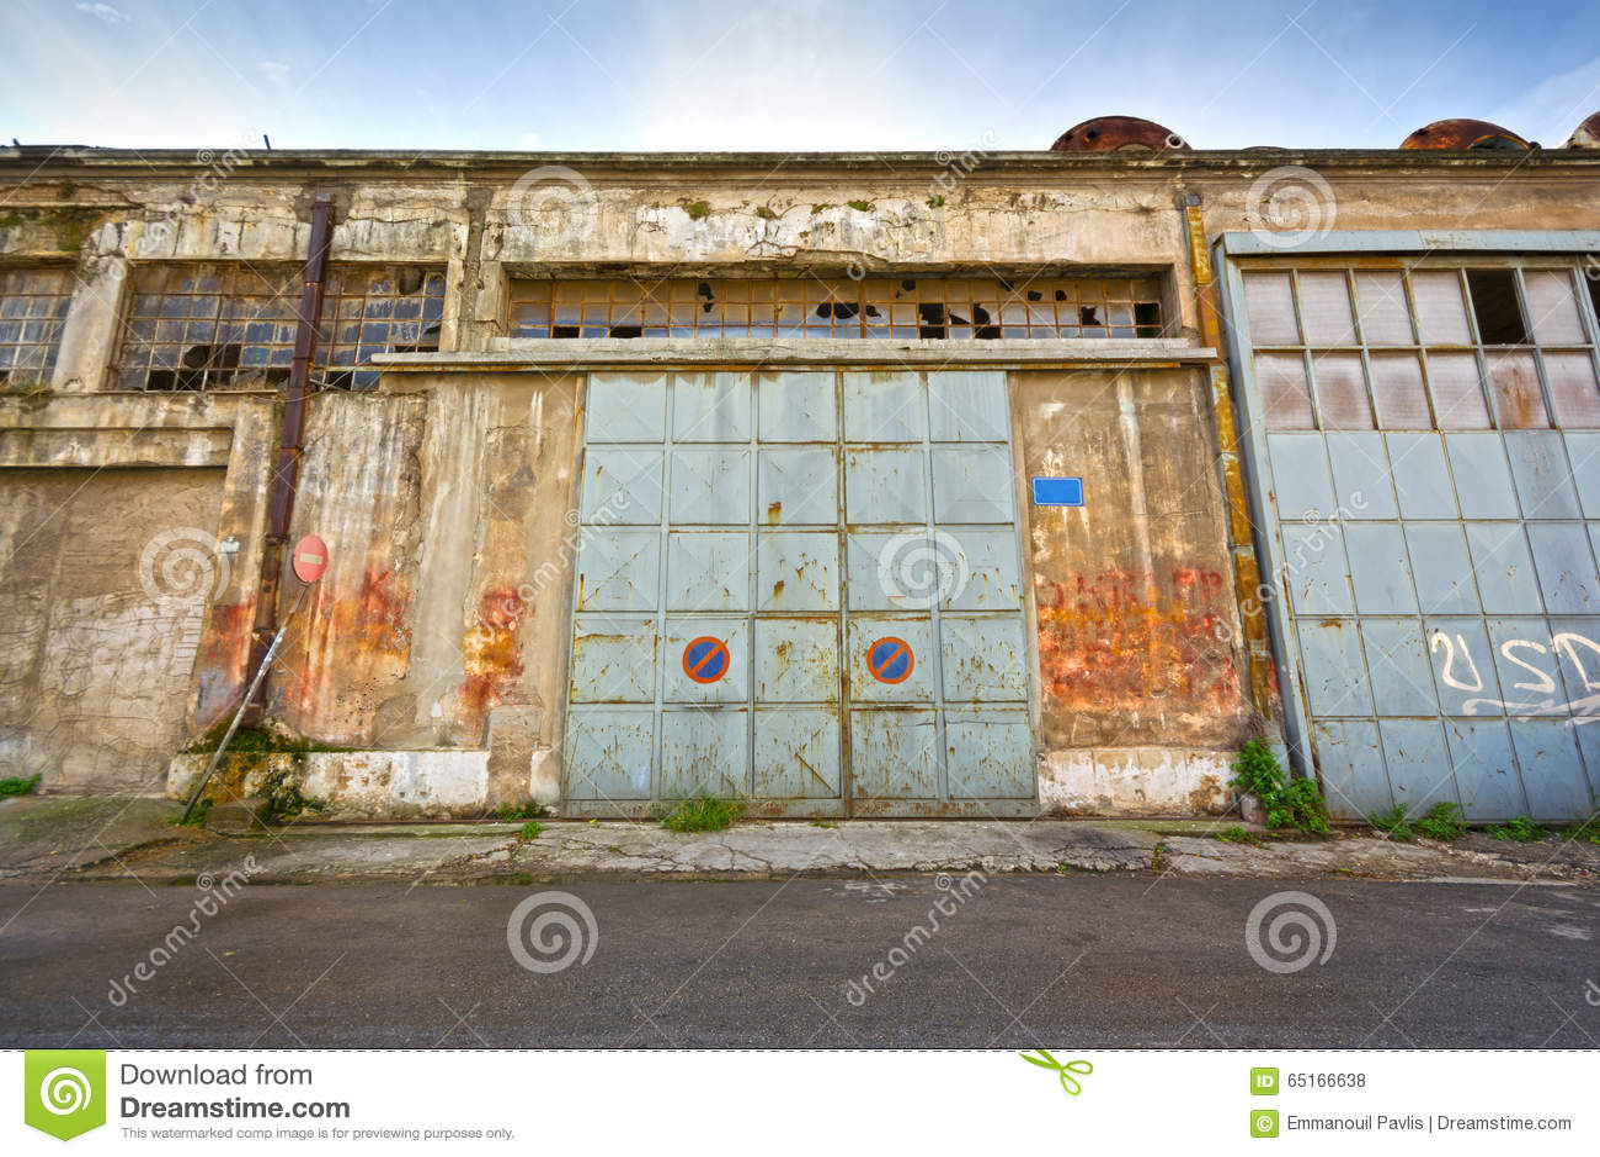 Sliding Metal Doors Stock Photo Image Of Bankruptcy 65166638